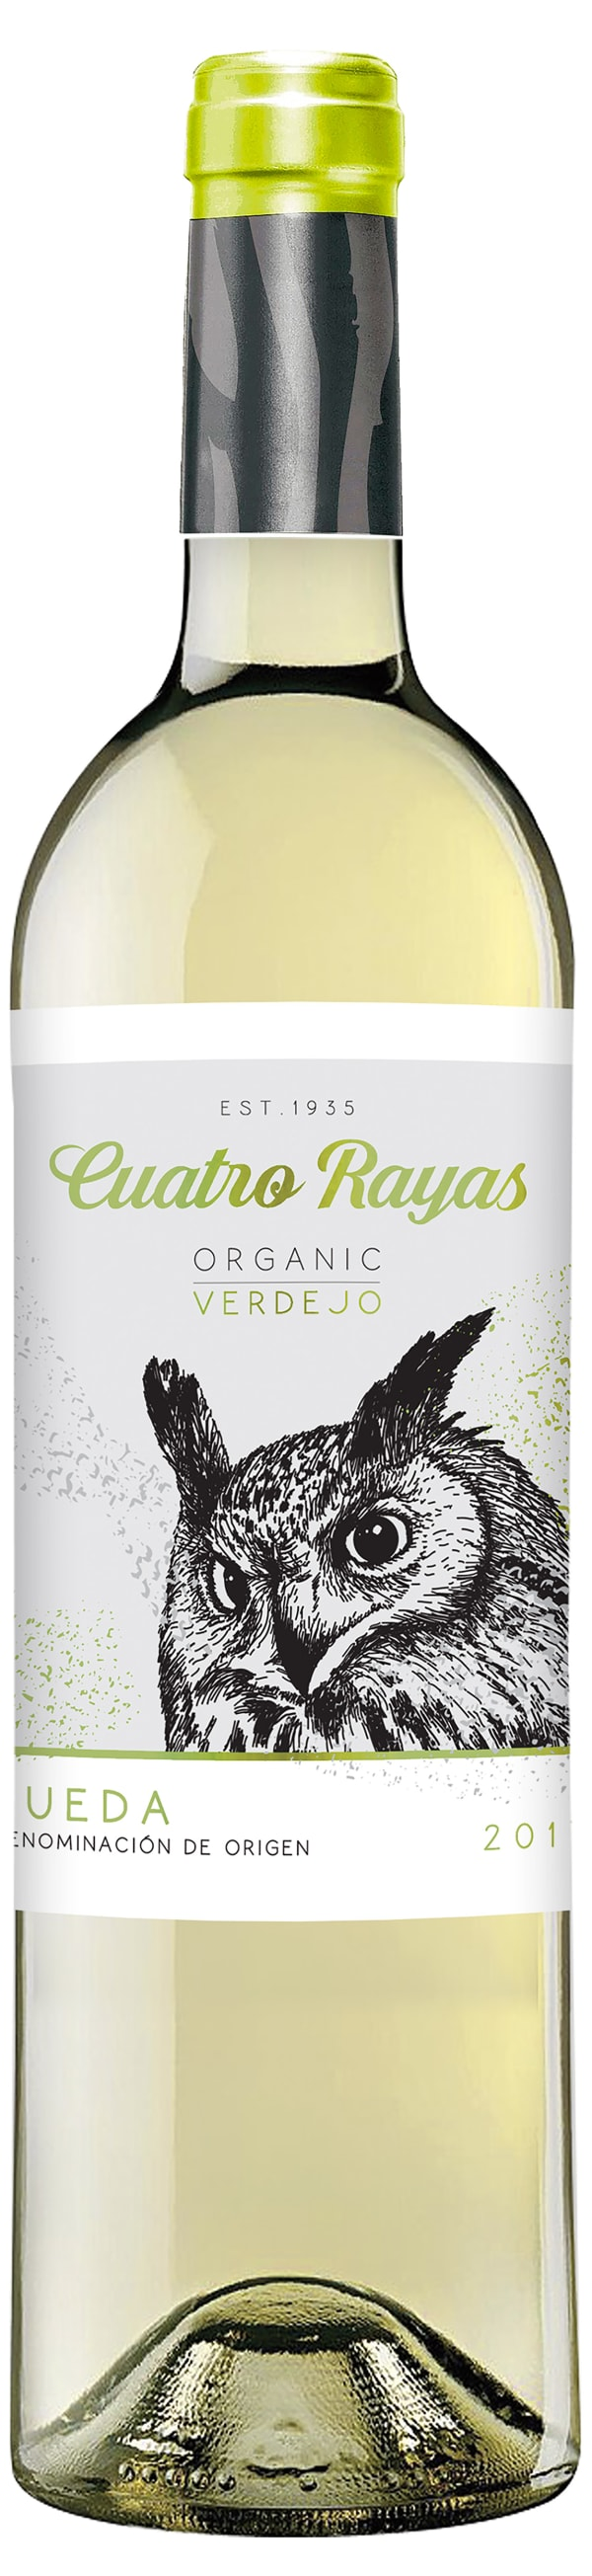 Cuatro Rayas Organic Verdejo 2017